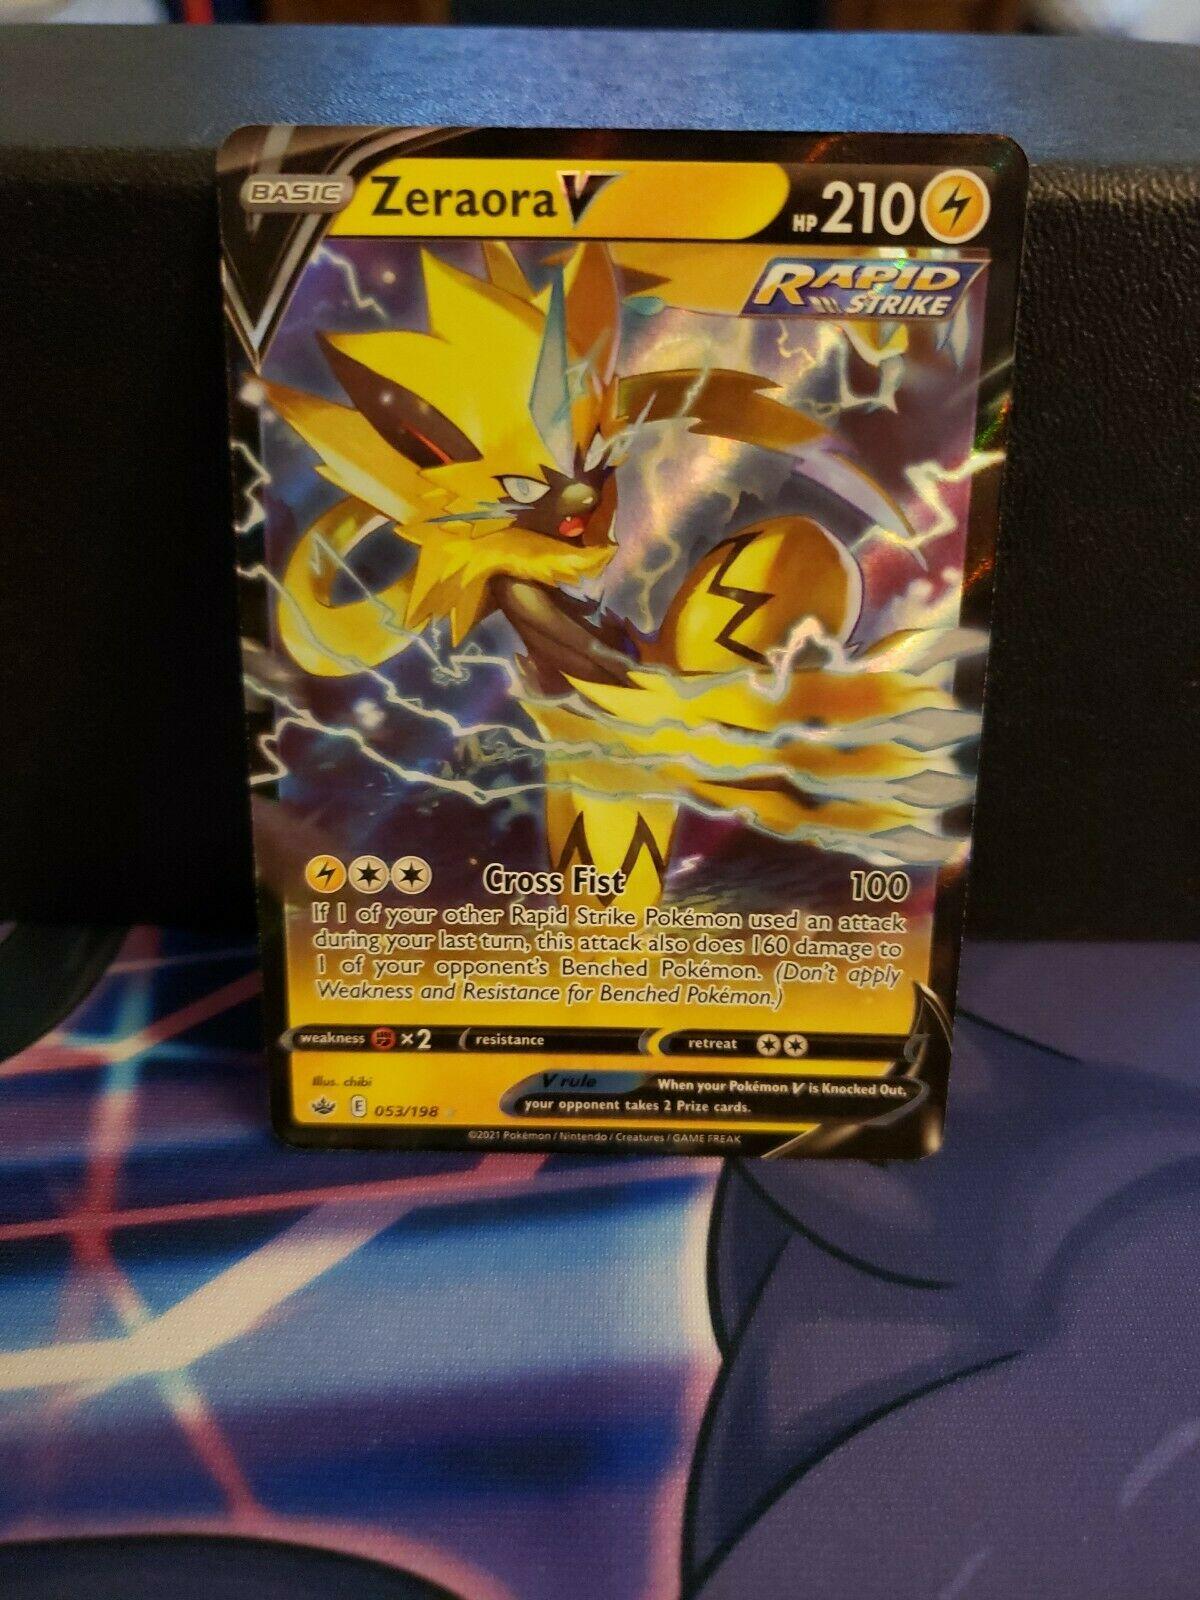 Zeraora V Pokemon Chilling Reign Card 053/198 Mint Condition